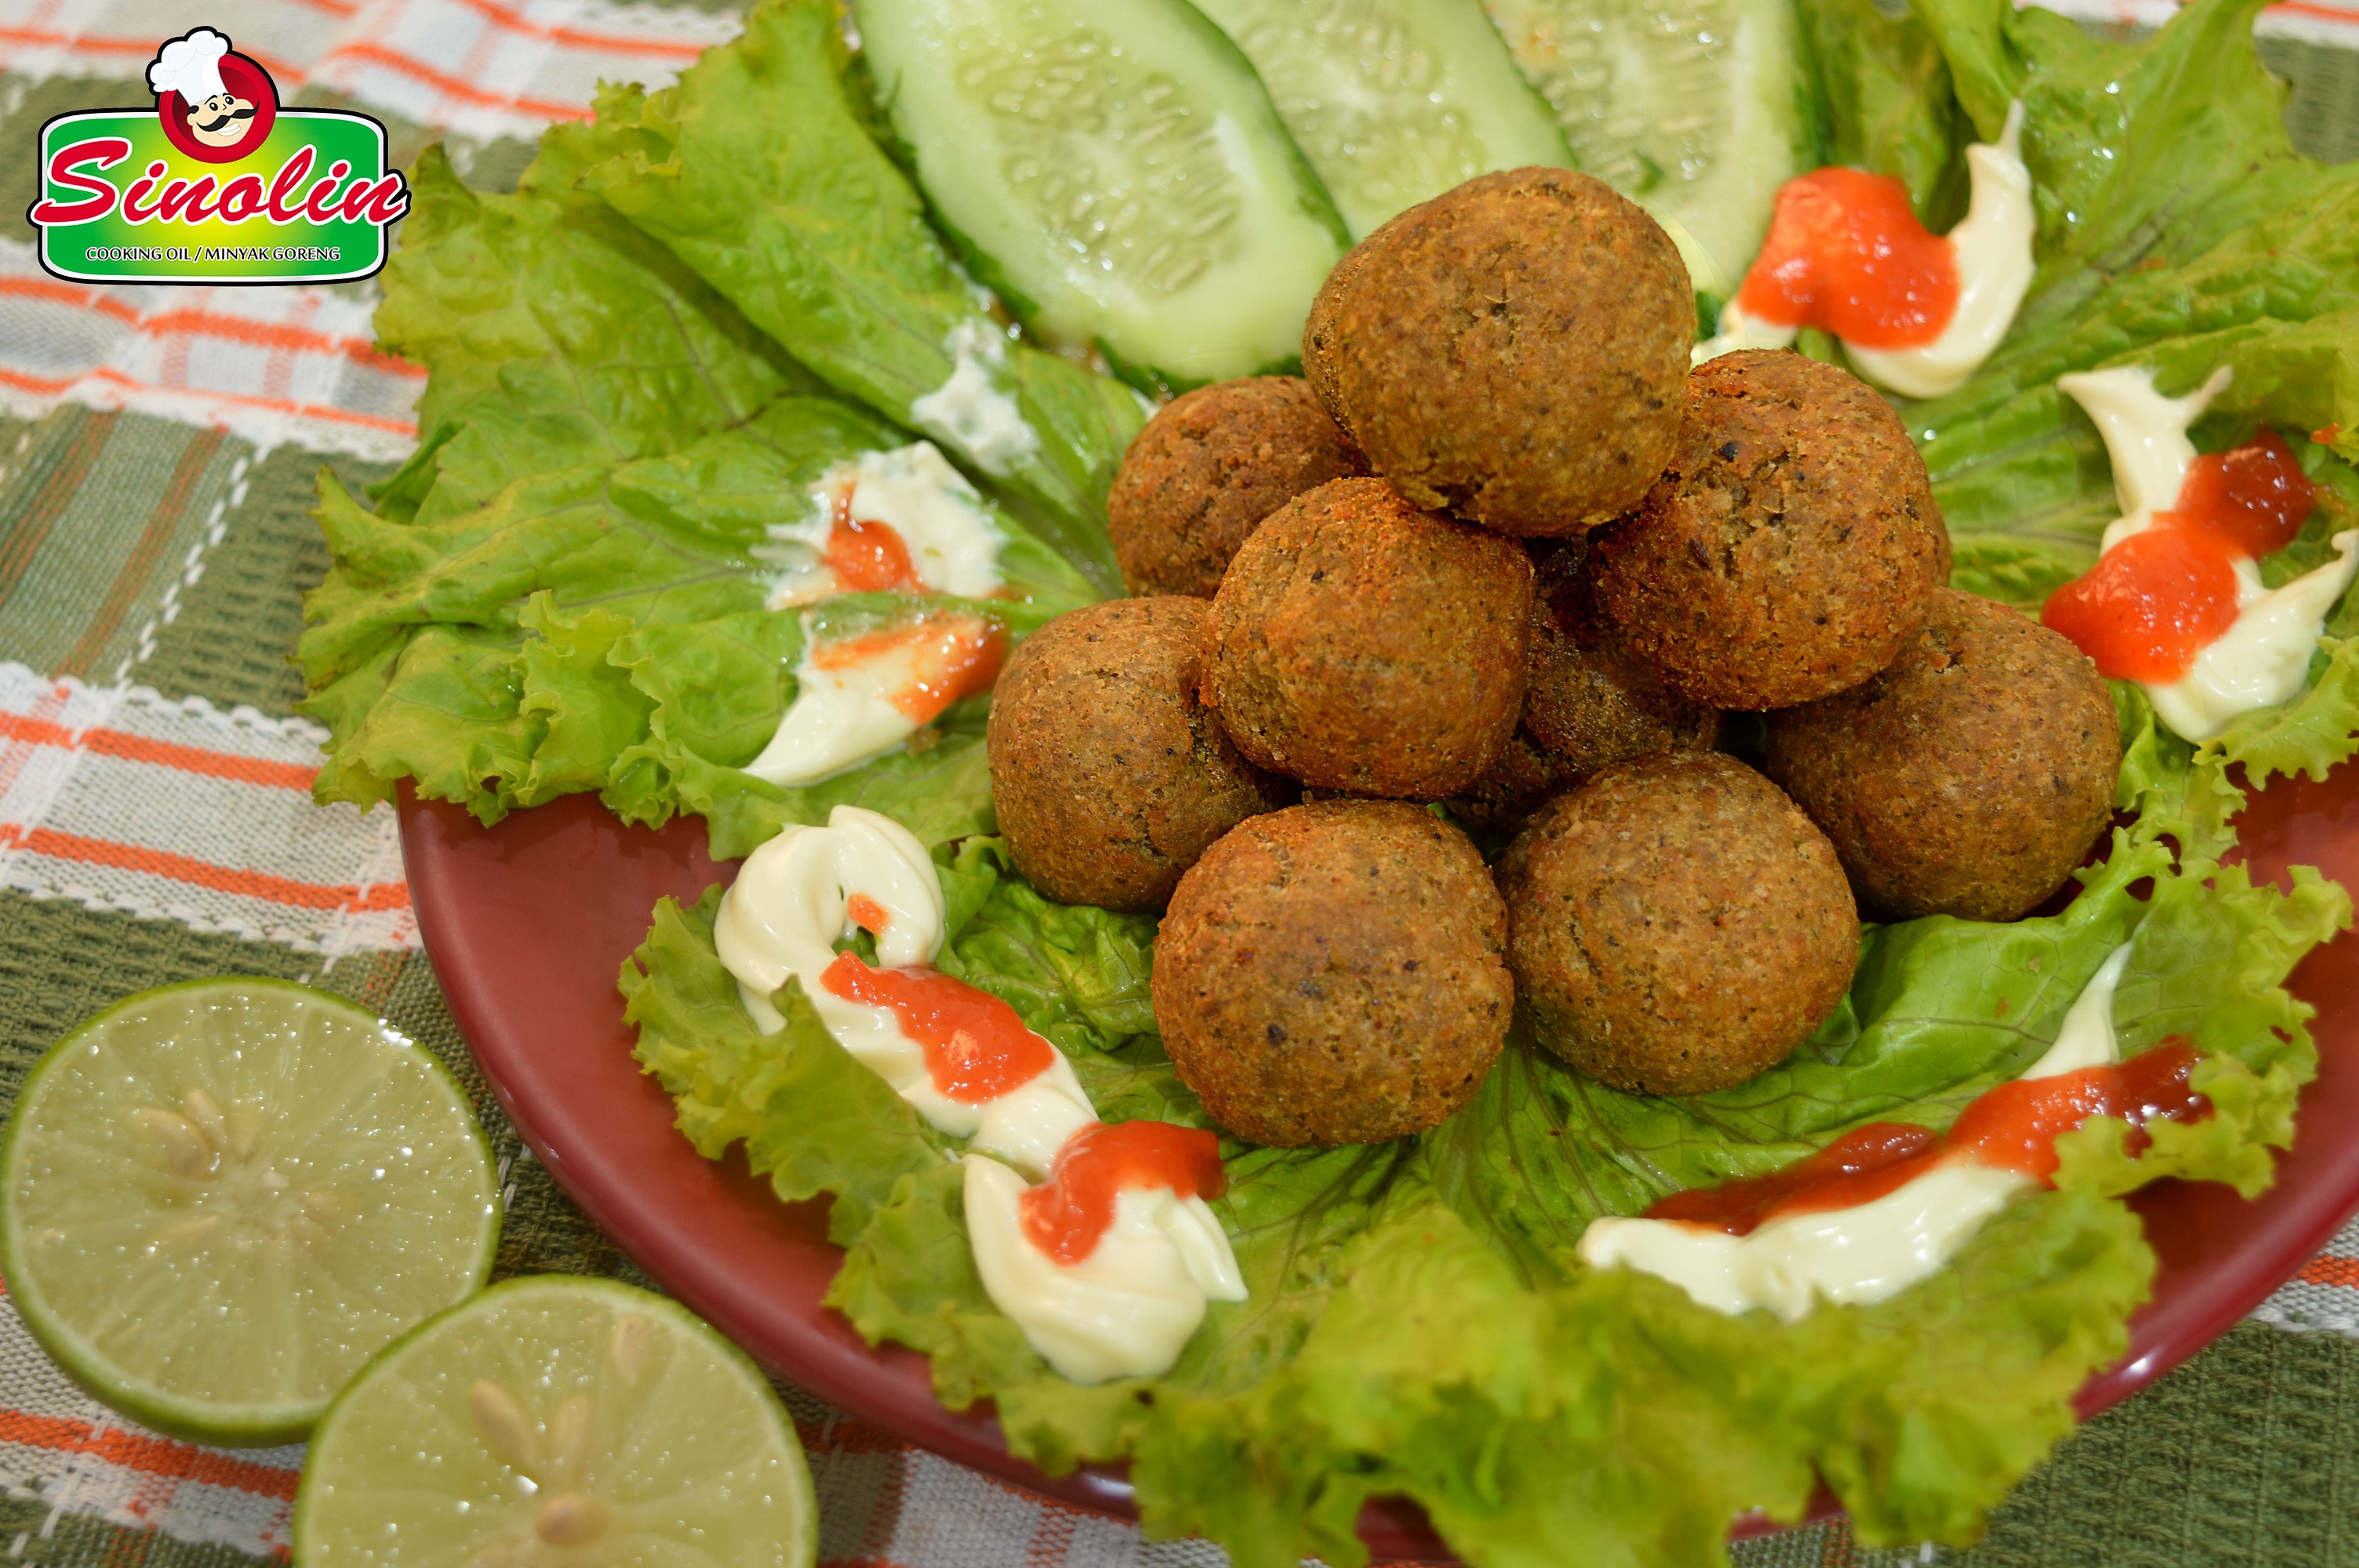 Resep Bola-bola Vegetarian by Dapur Sinolin